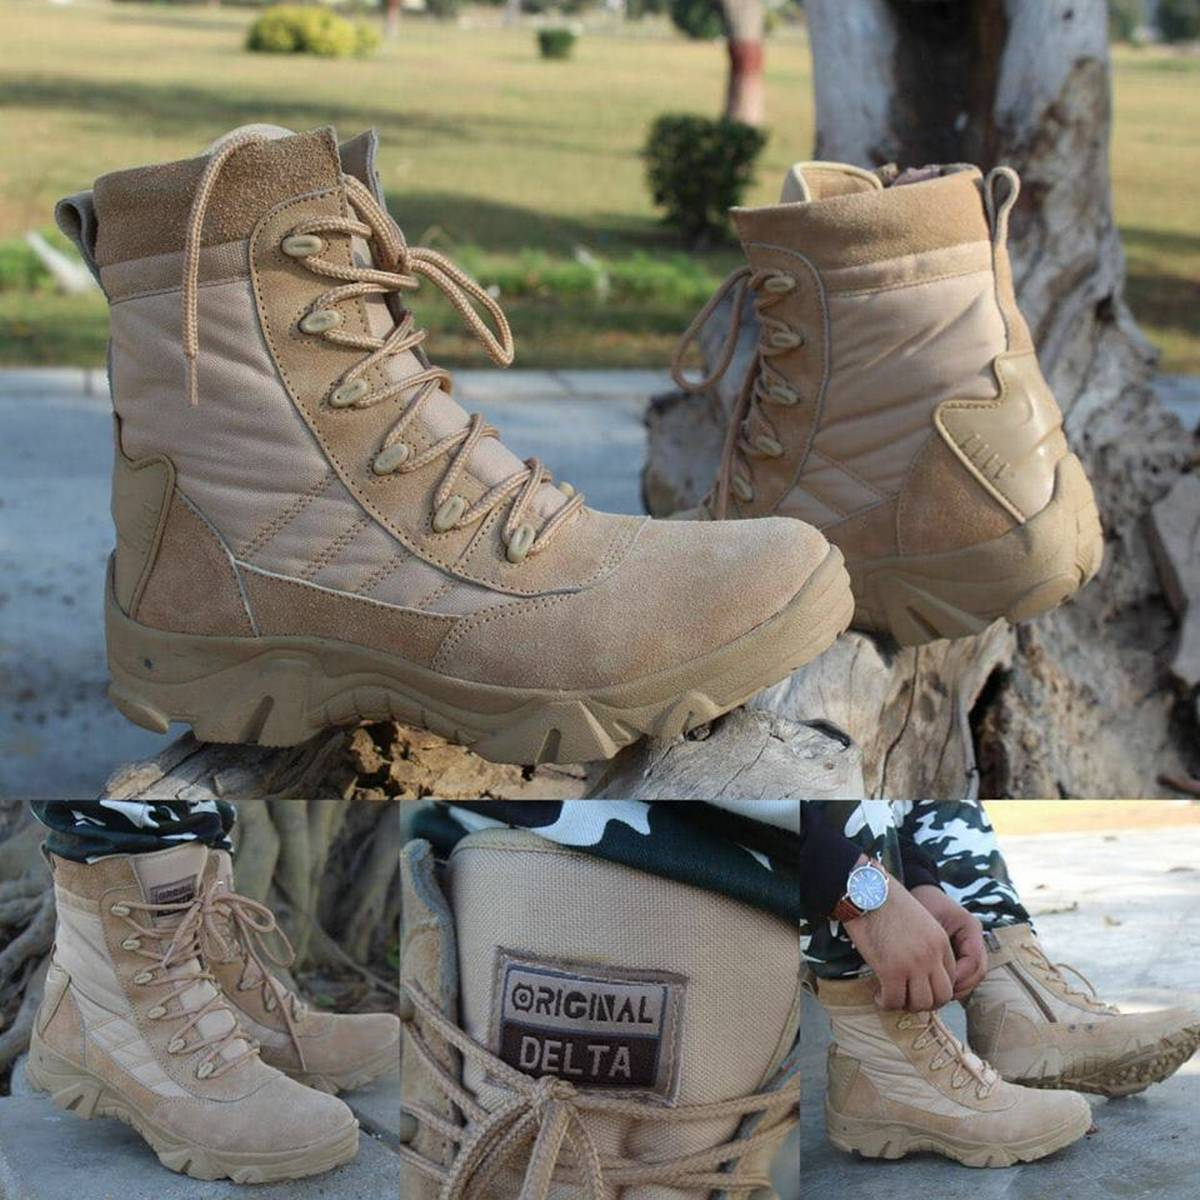 Khaki Leather Delta Boots For Men